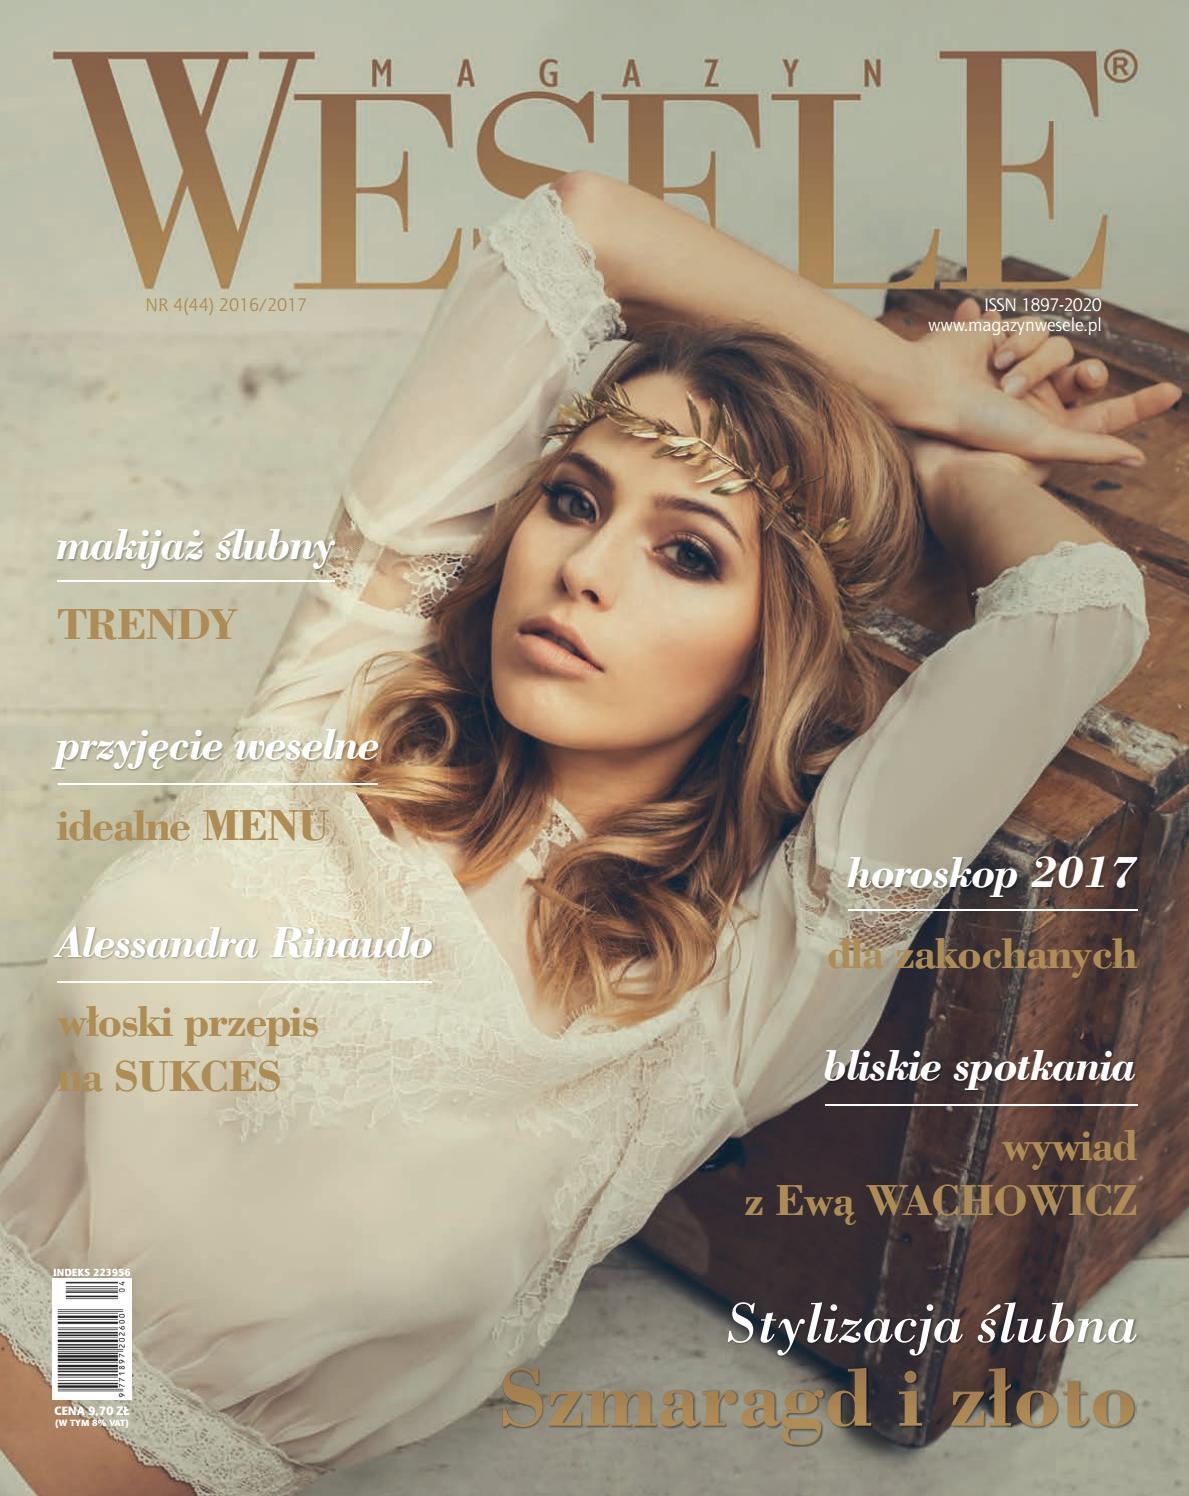 ba32f3193f Magazyn WESELE 2 42 2016 by Magazyn Wesele - issuu